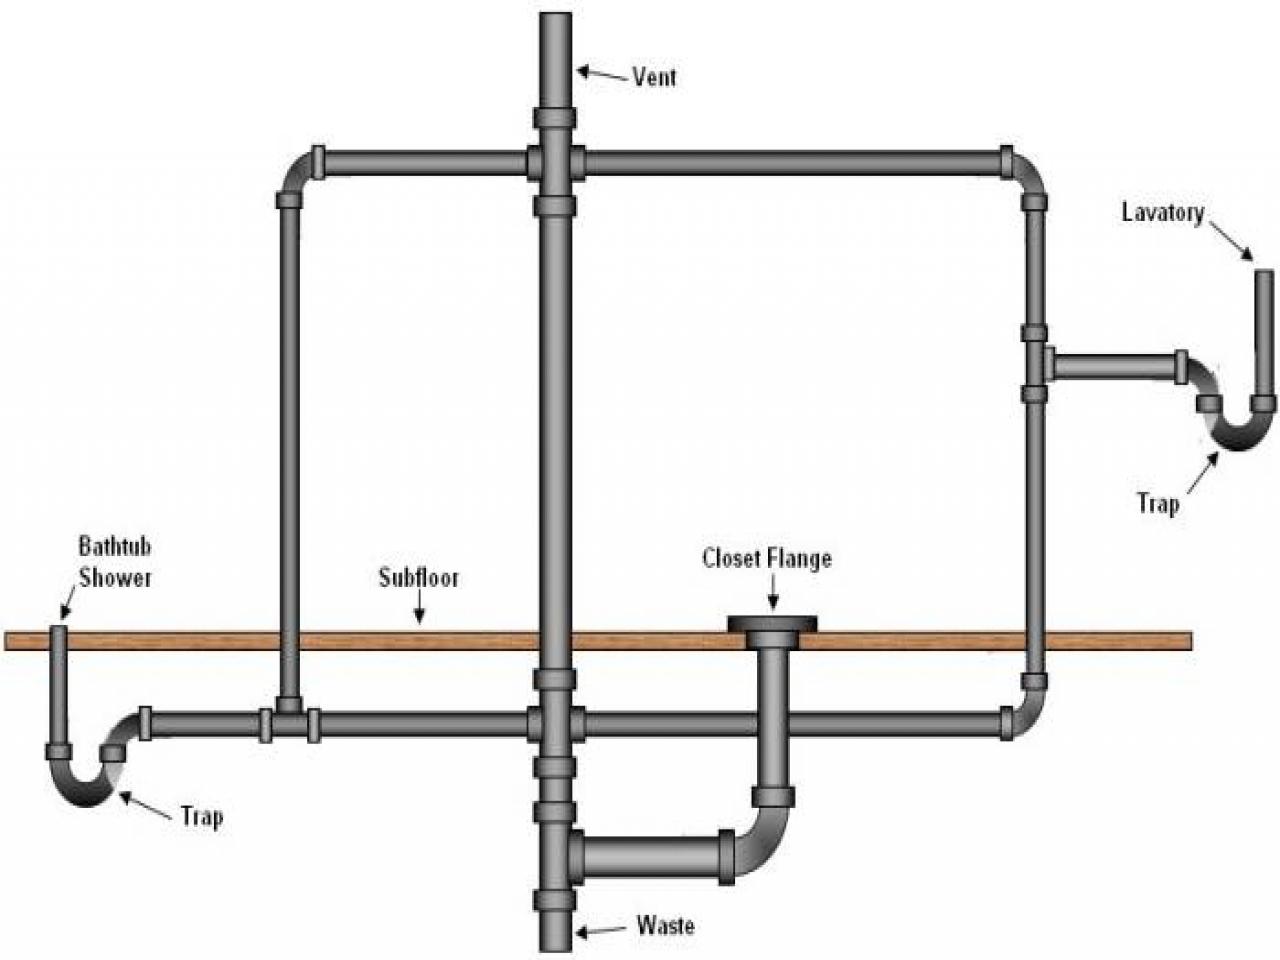 Sink Plumbing Diagram Kitchen Sink Drain Assembly Diagram The Home Design 42 Inch Kitchen Sink